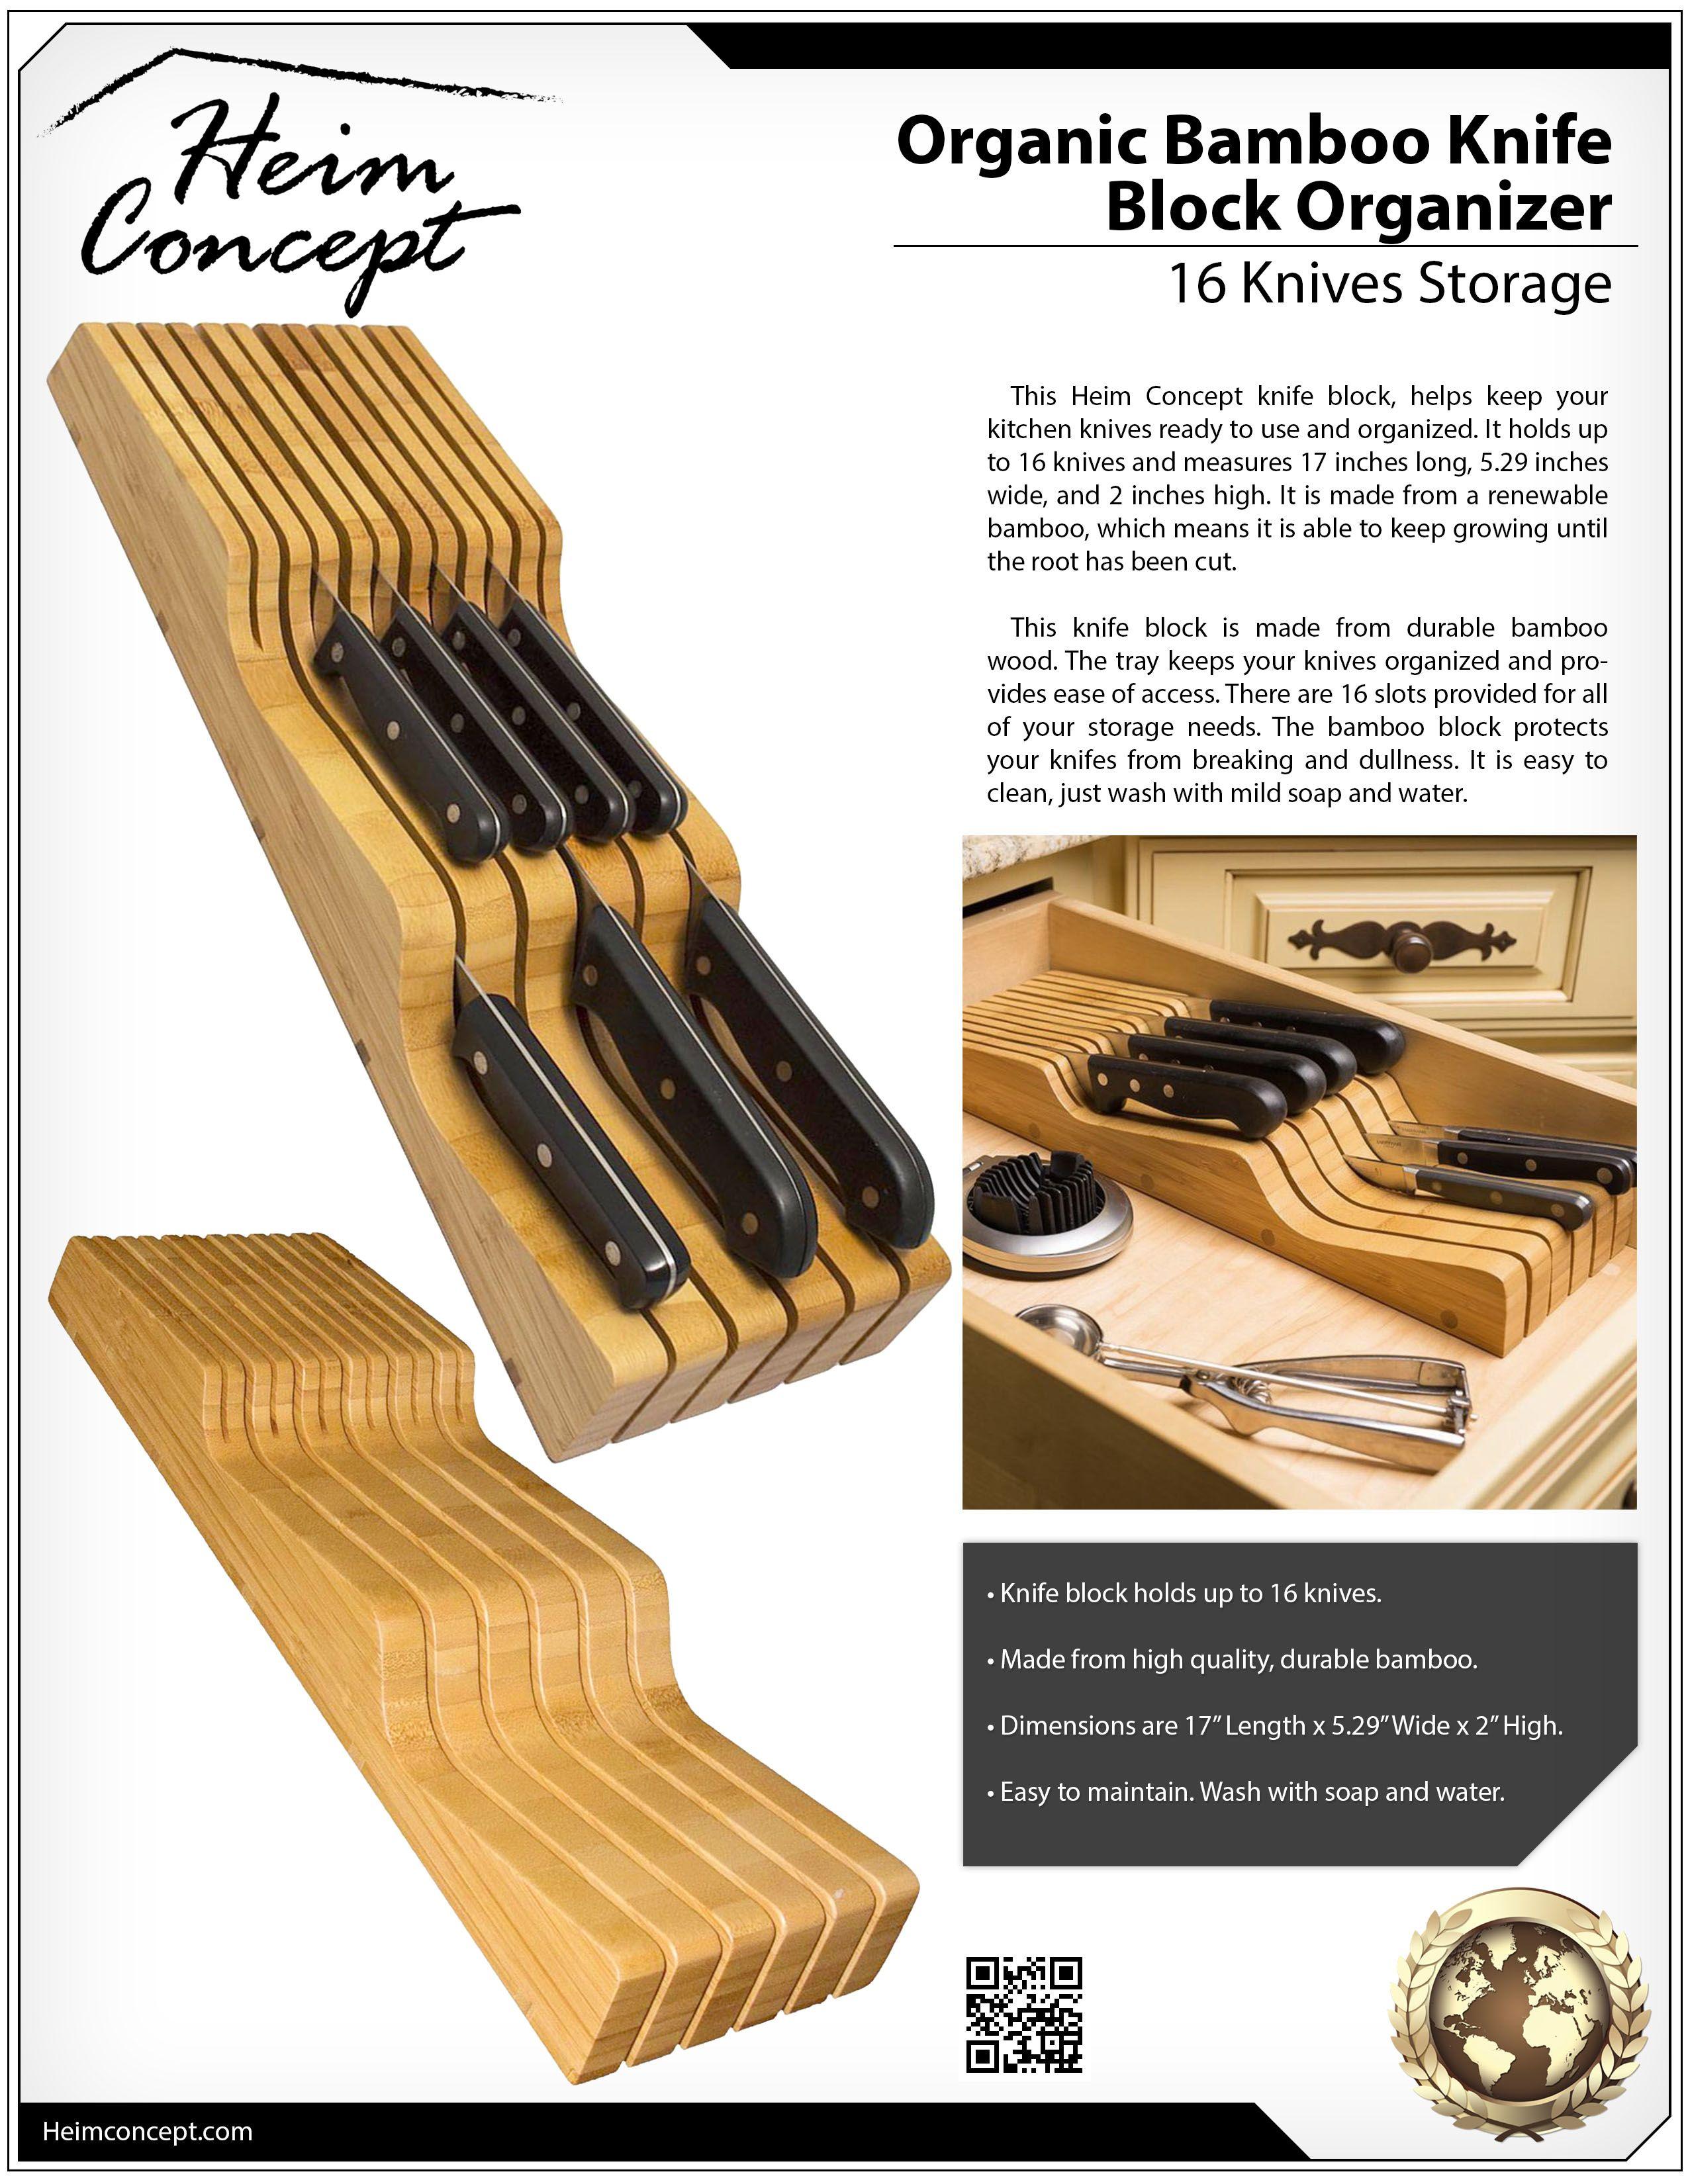 Organic Bamboo Knife Block Organizer, Heim Concept In  Drawer Premium  Bamboo Wood Knife Storage